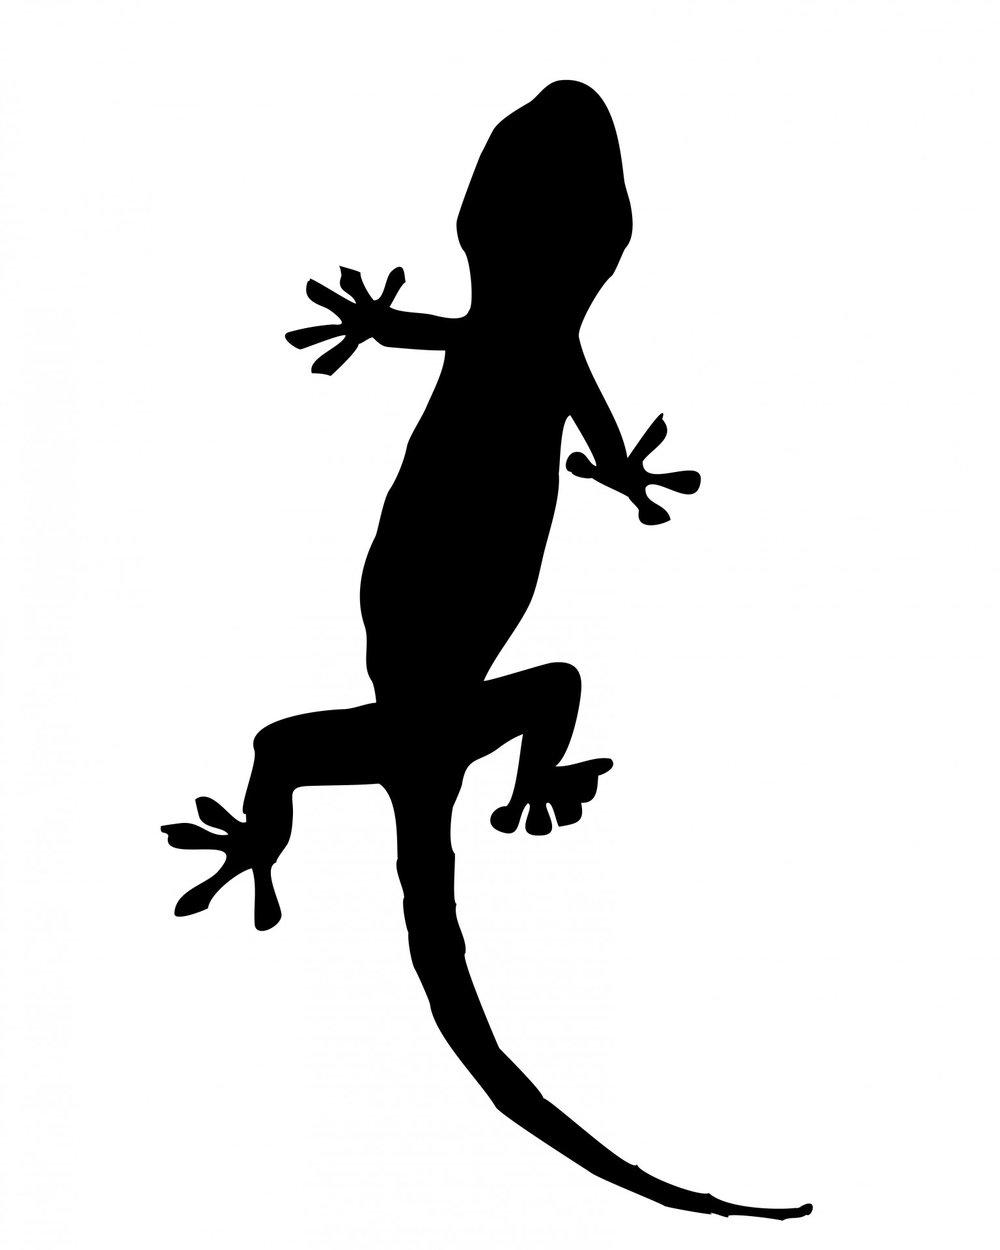 23 species of reptiles